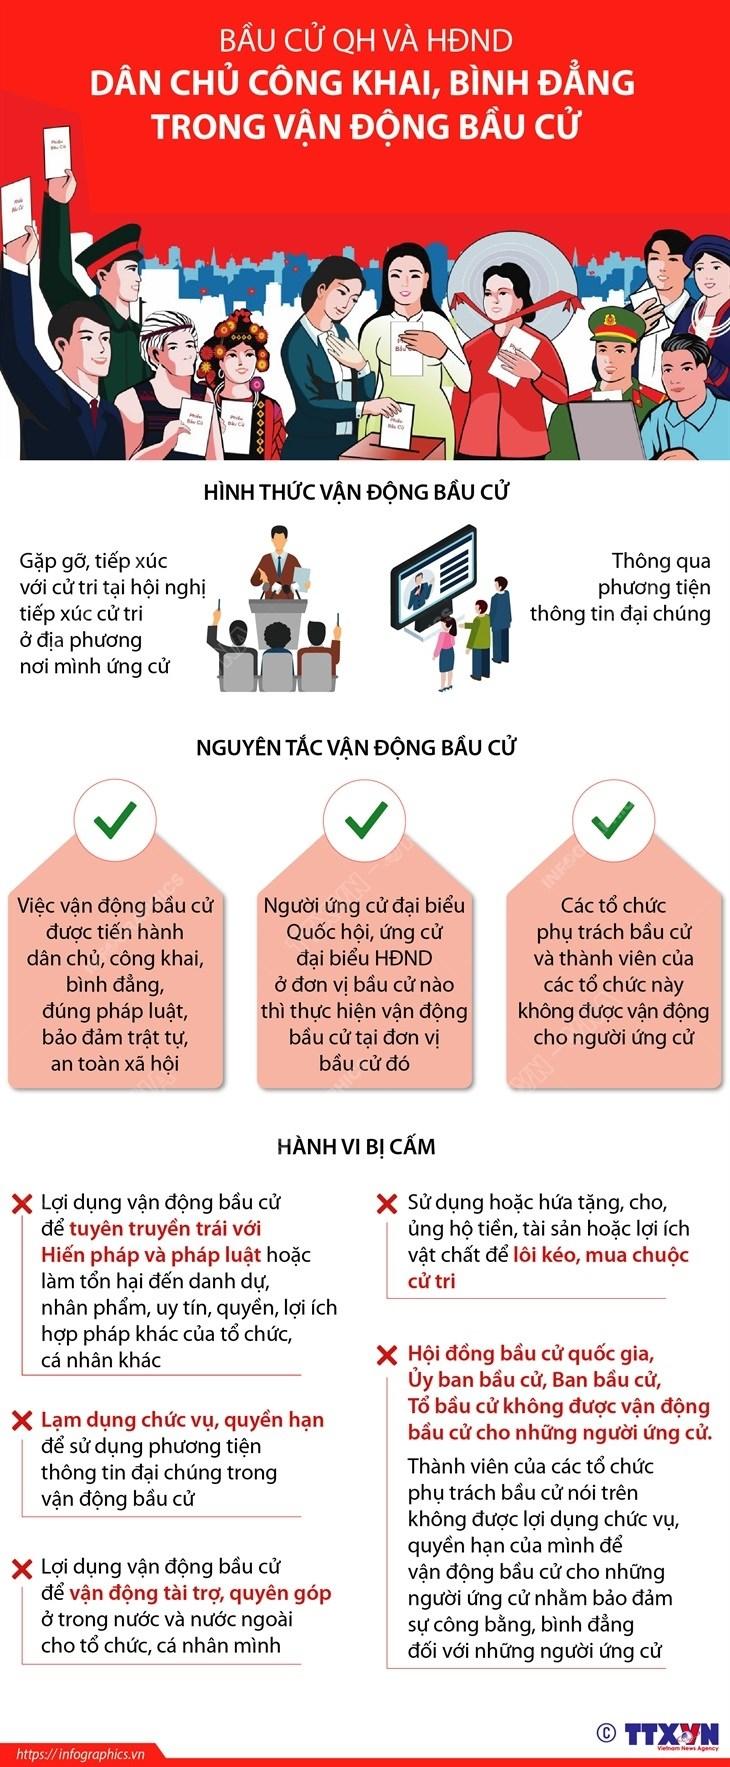 [Infographics] Cac nguyen tac va hanh vi bi cam khi van dong bau cu hinh anh 1